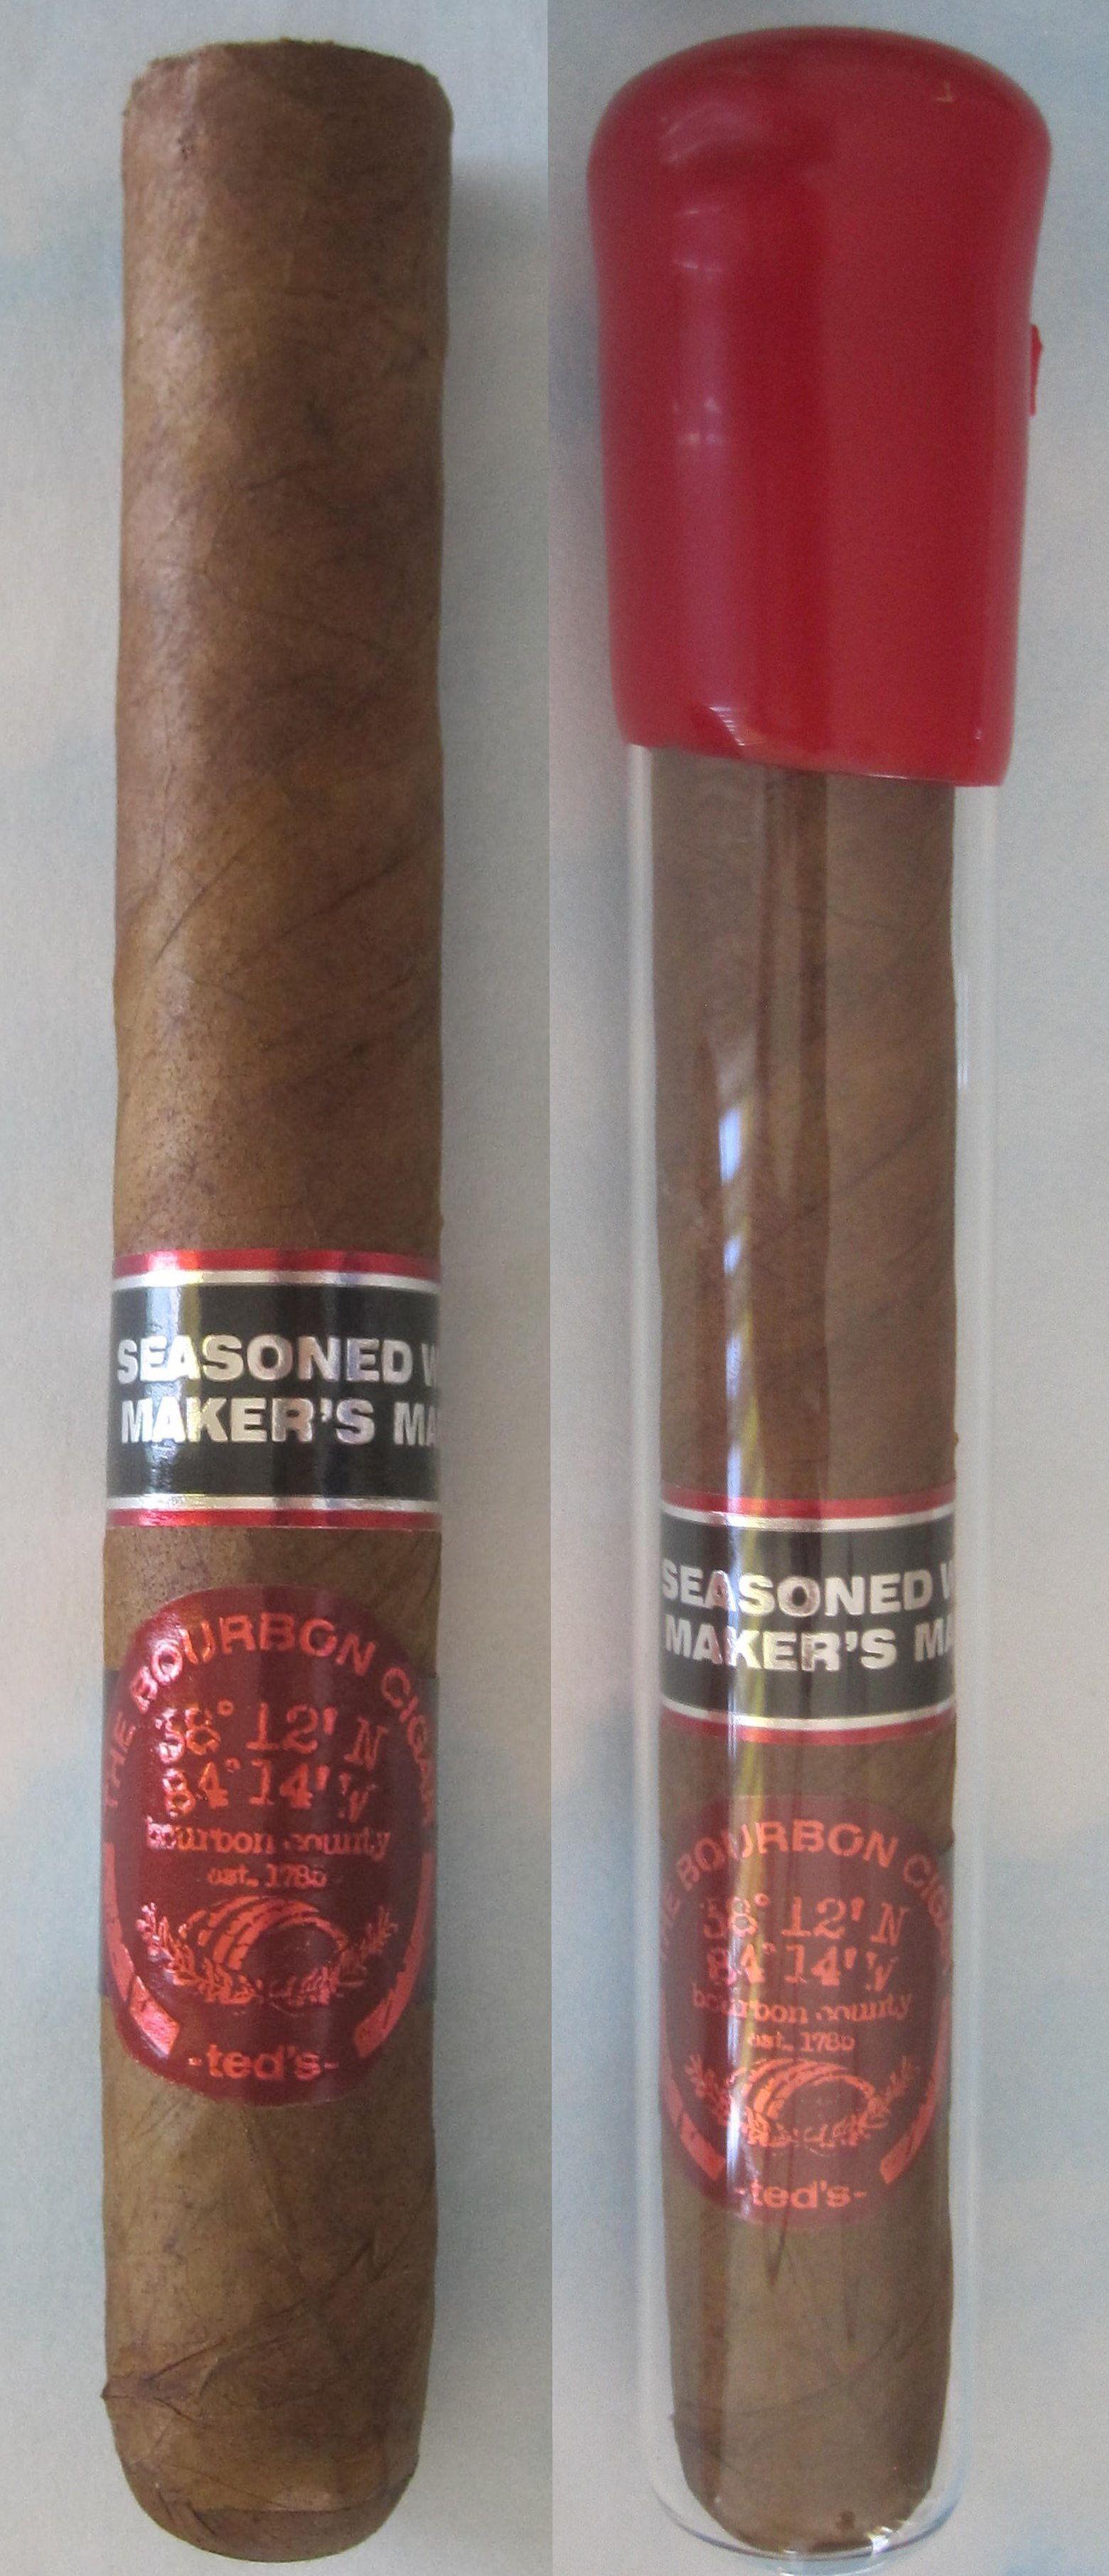 Ted's Bourbon Cigar